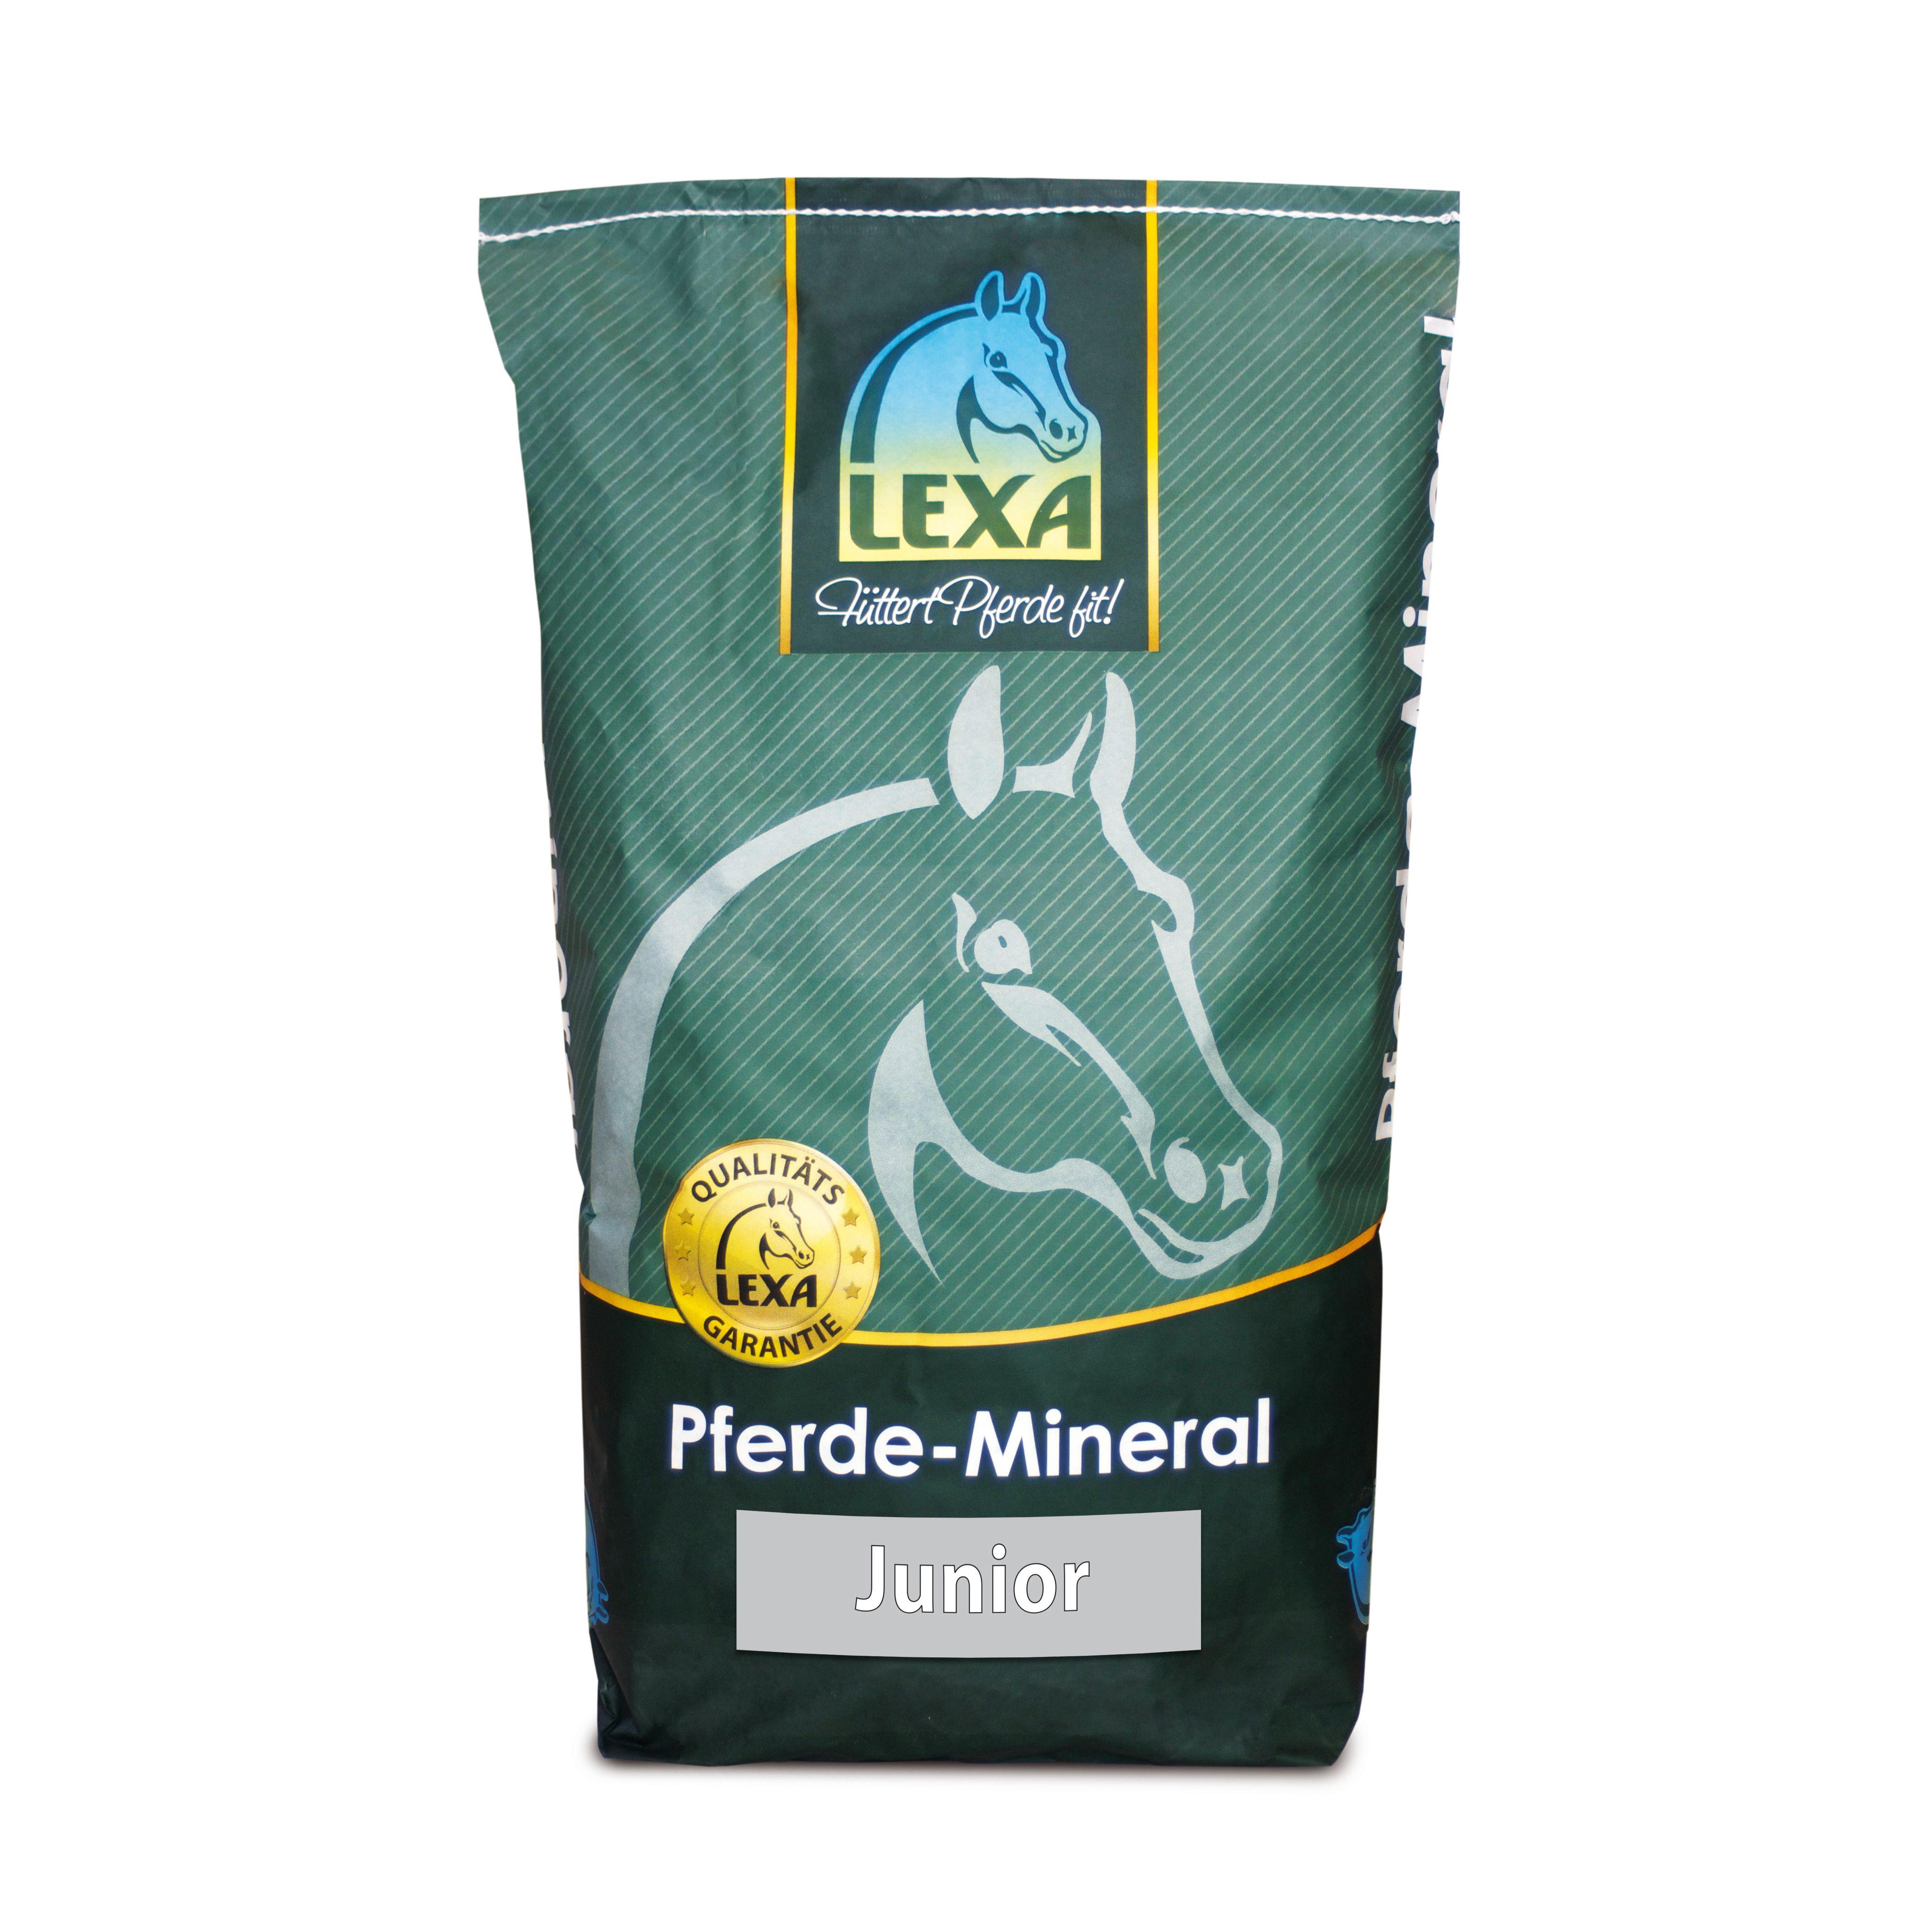 Lexa Junior Mineral Sack